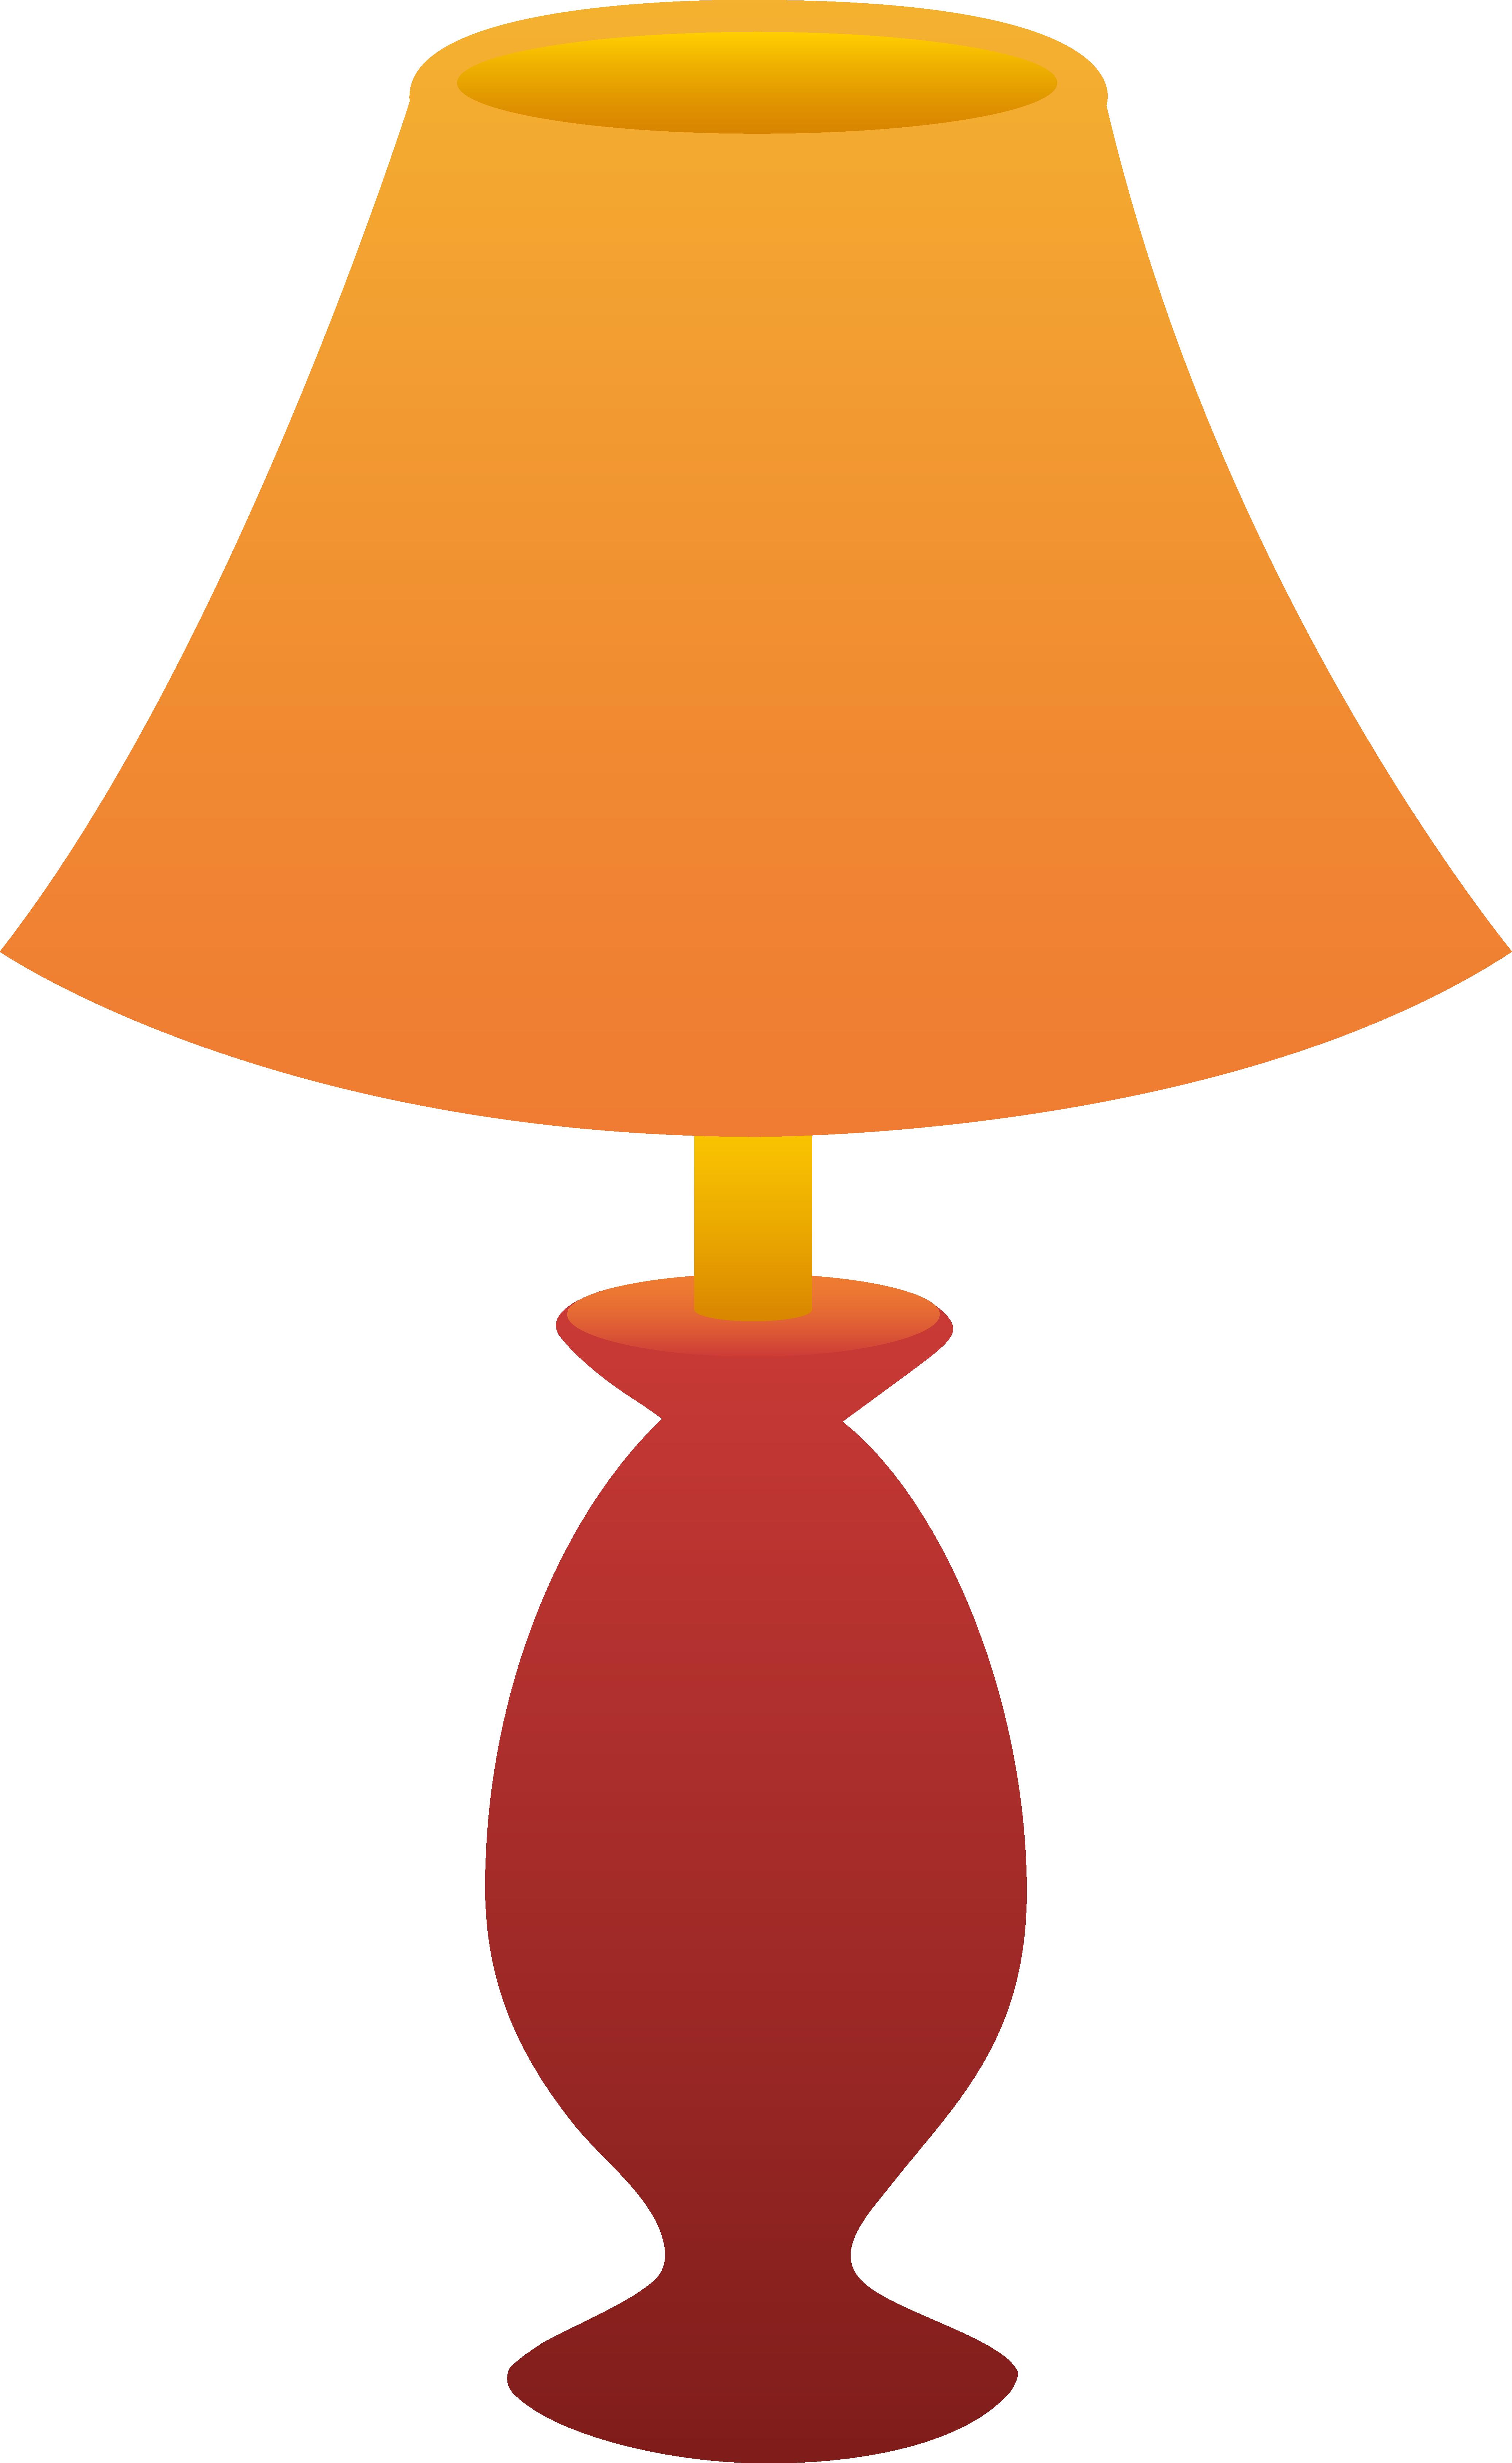 Clipart moon floor. Lamp free